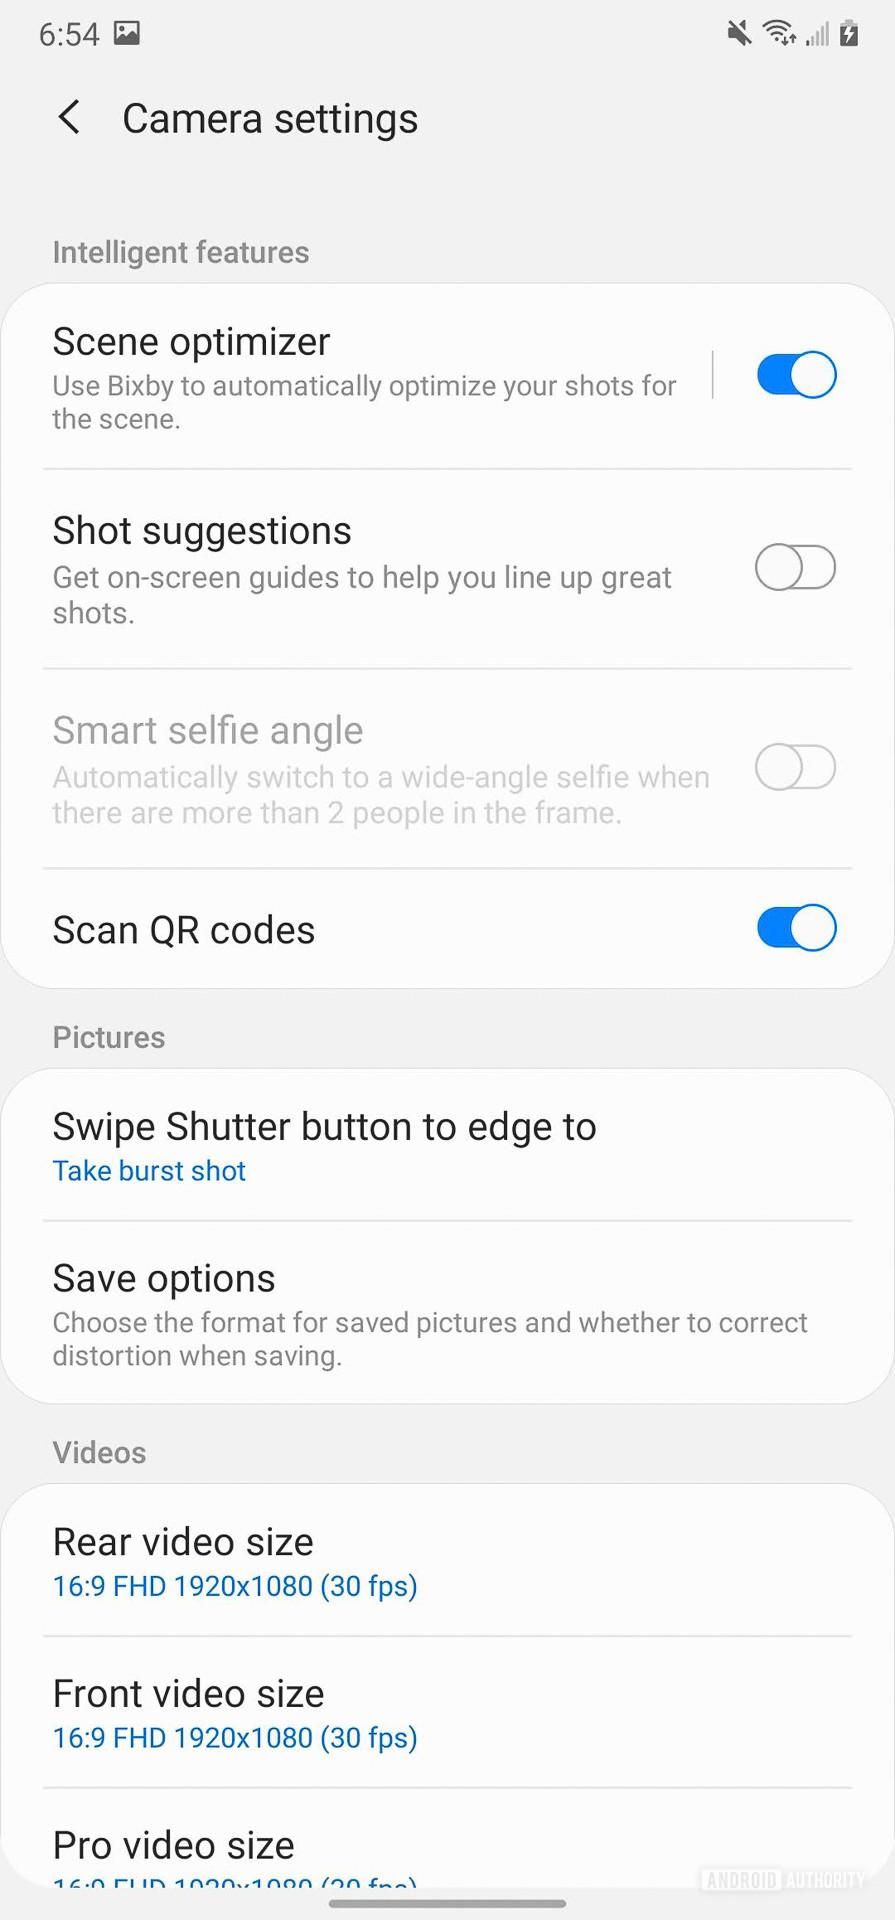 Samsung Galaxy Note 20 Ultra Camera settings